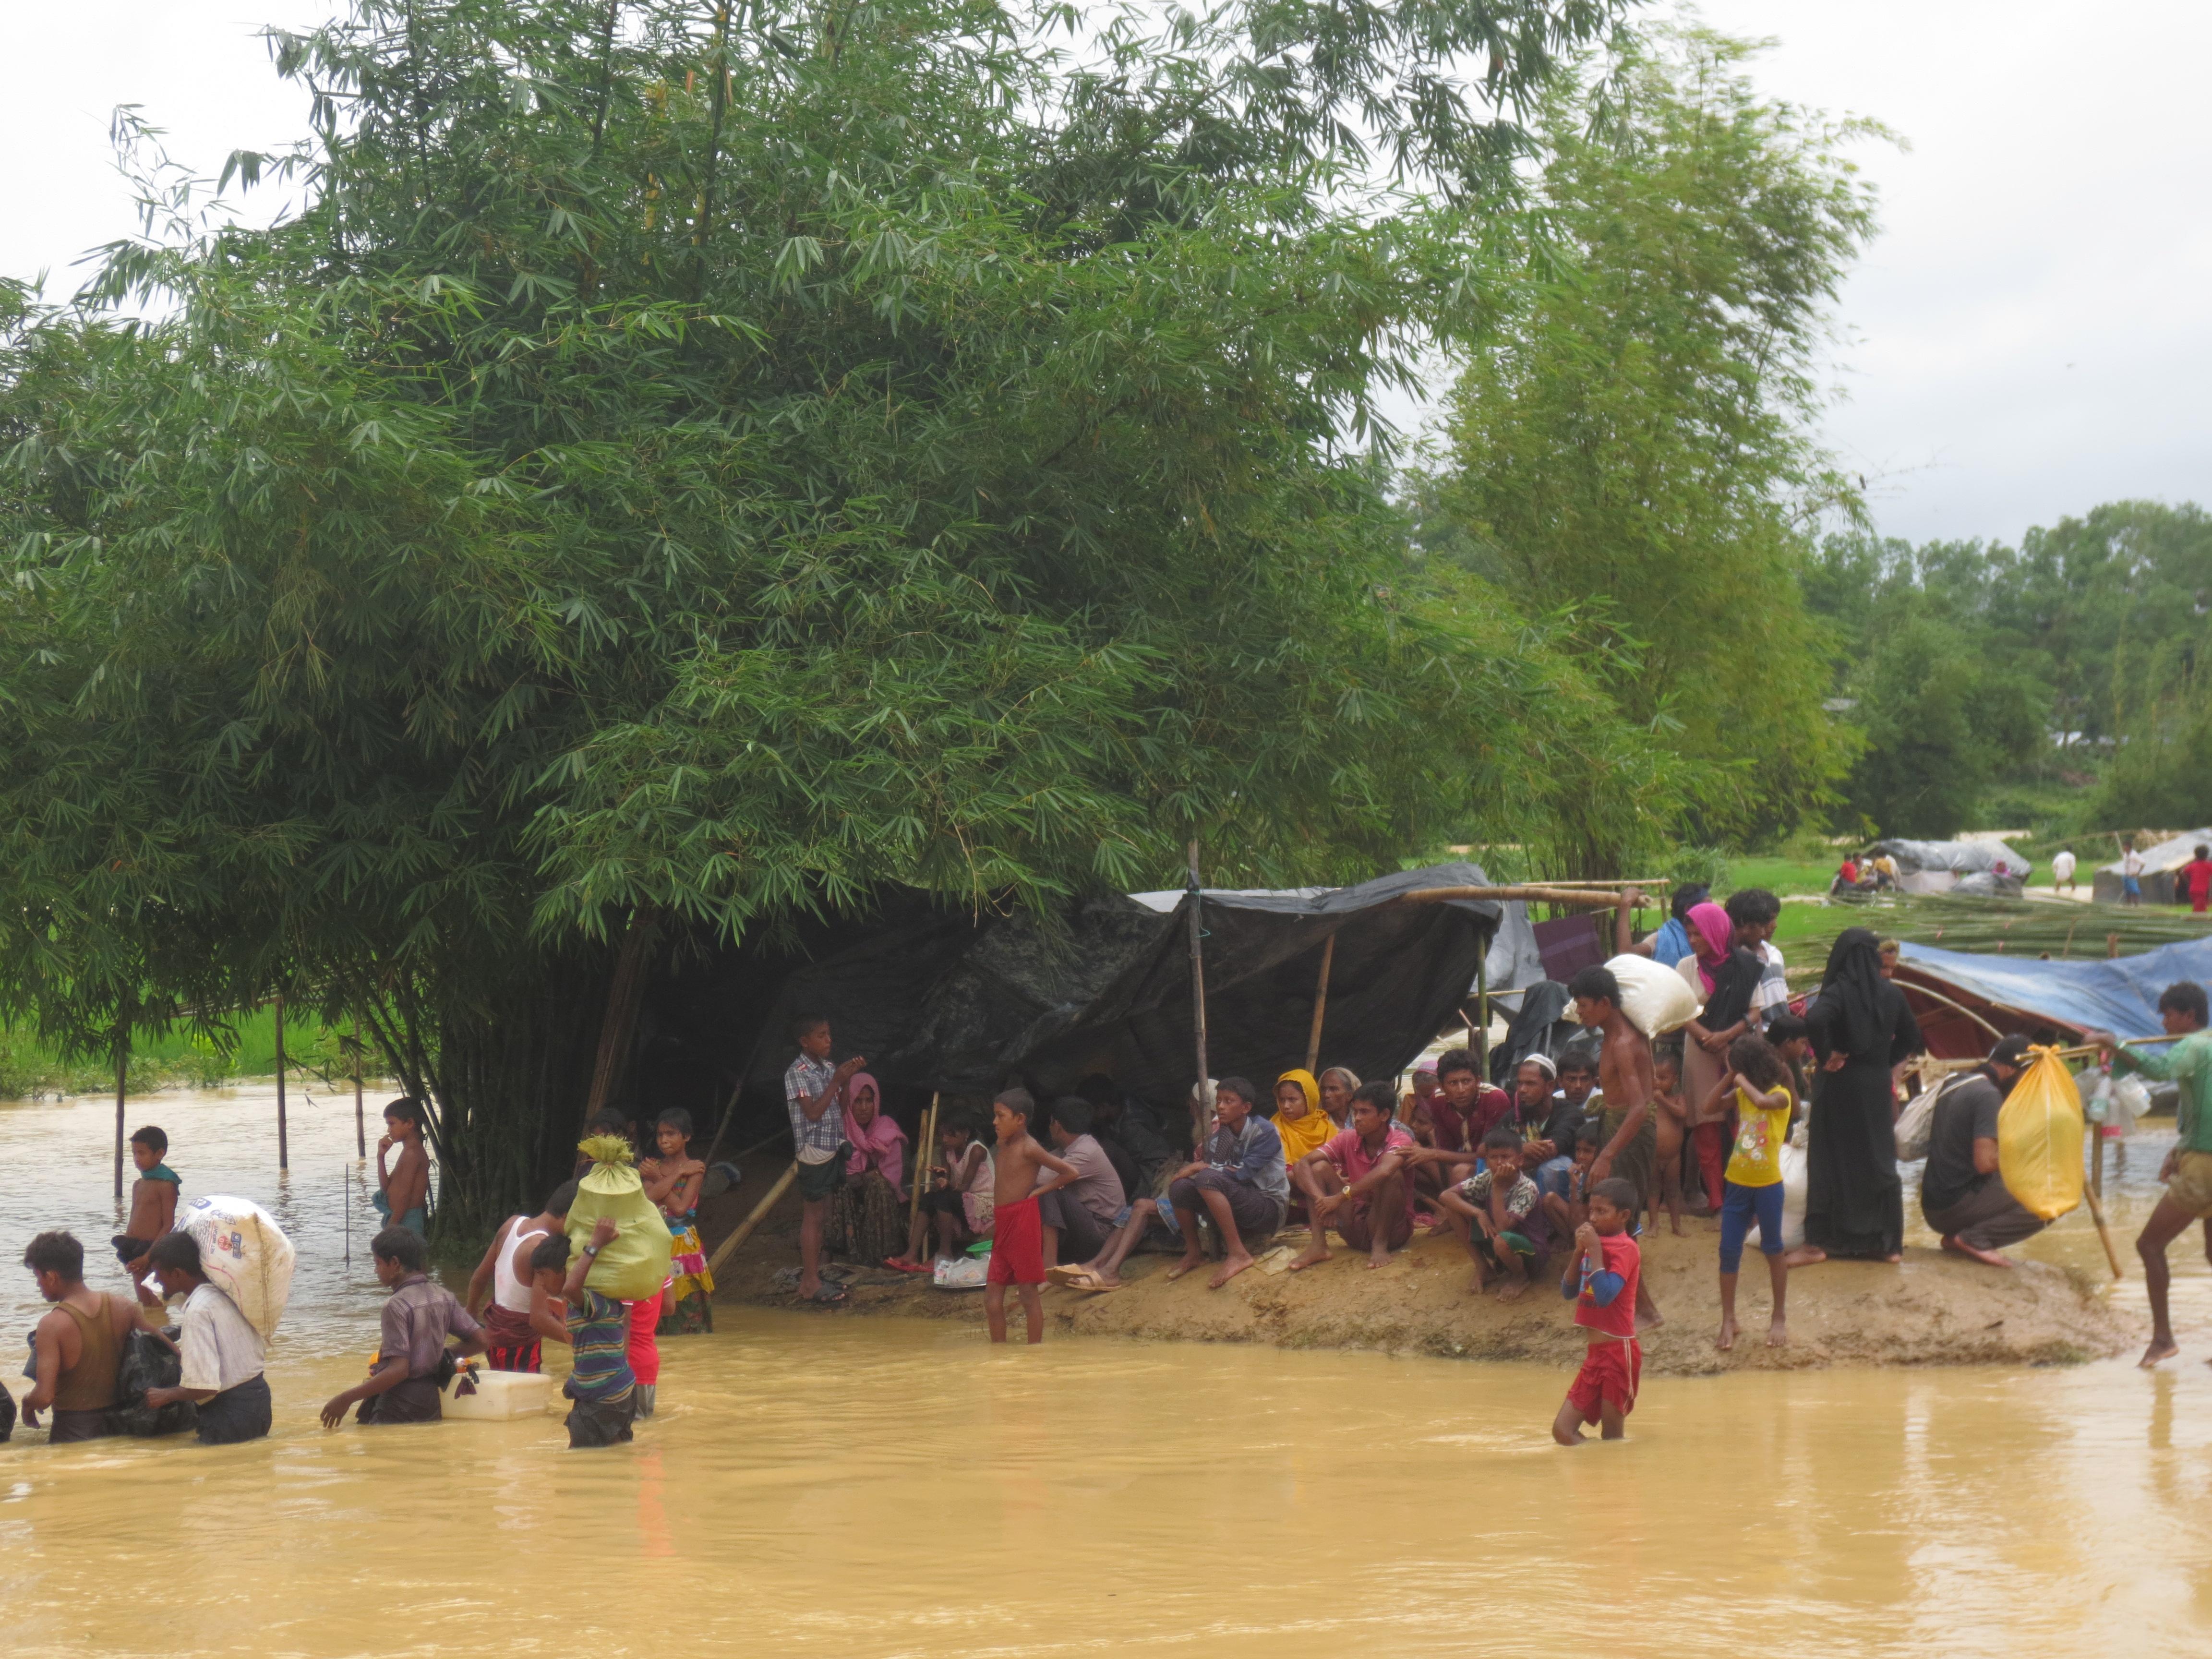 More Rohingya moved to the island of Bhasan Char